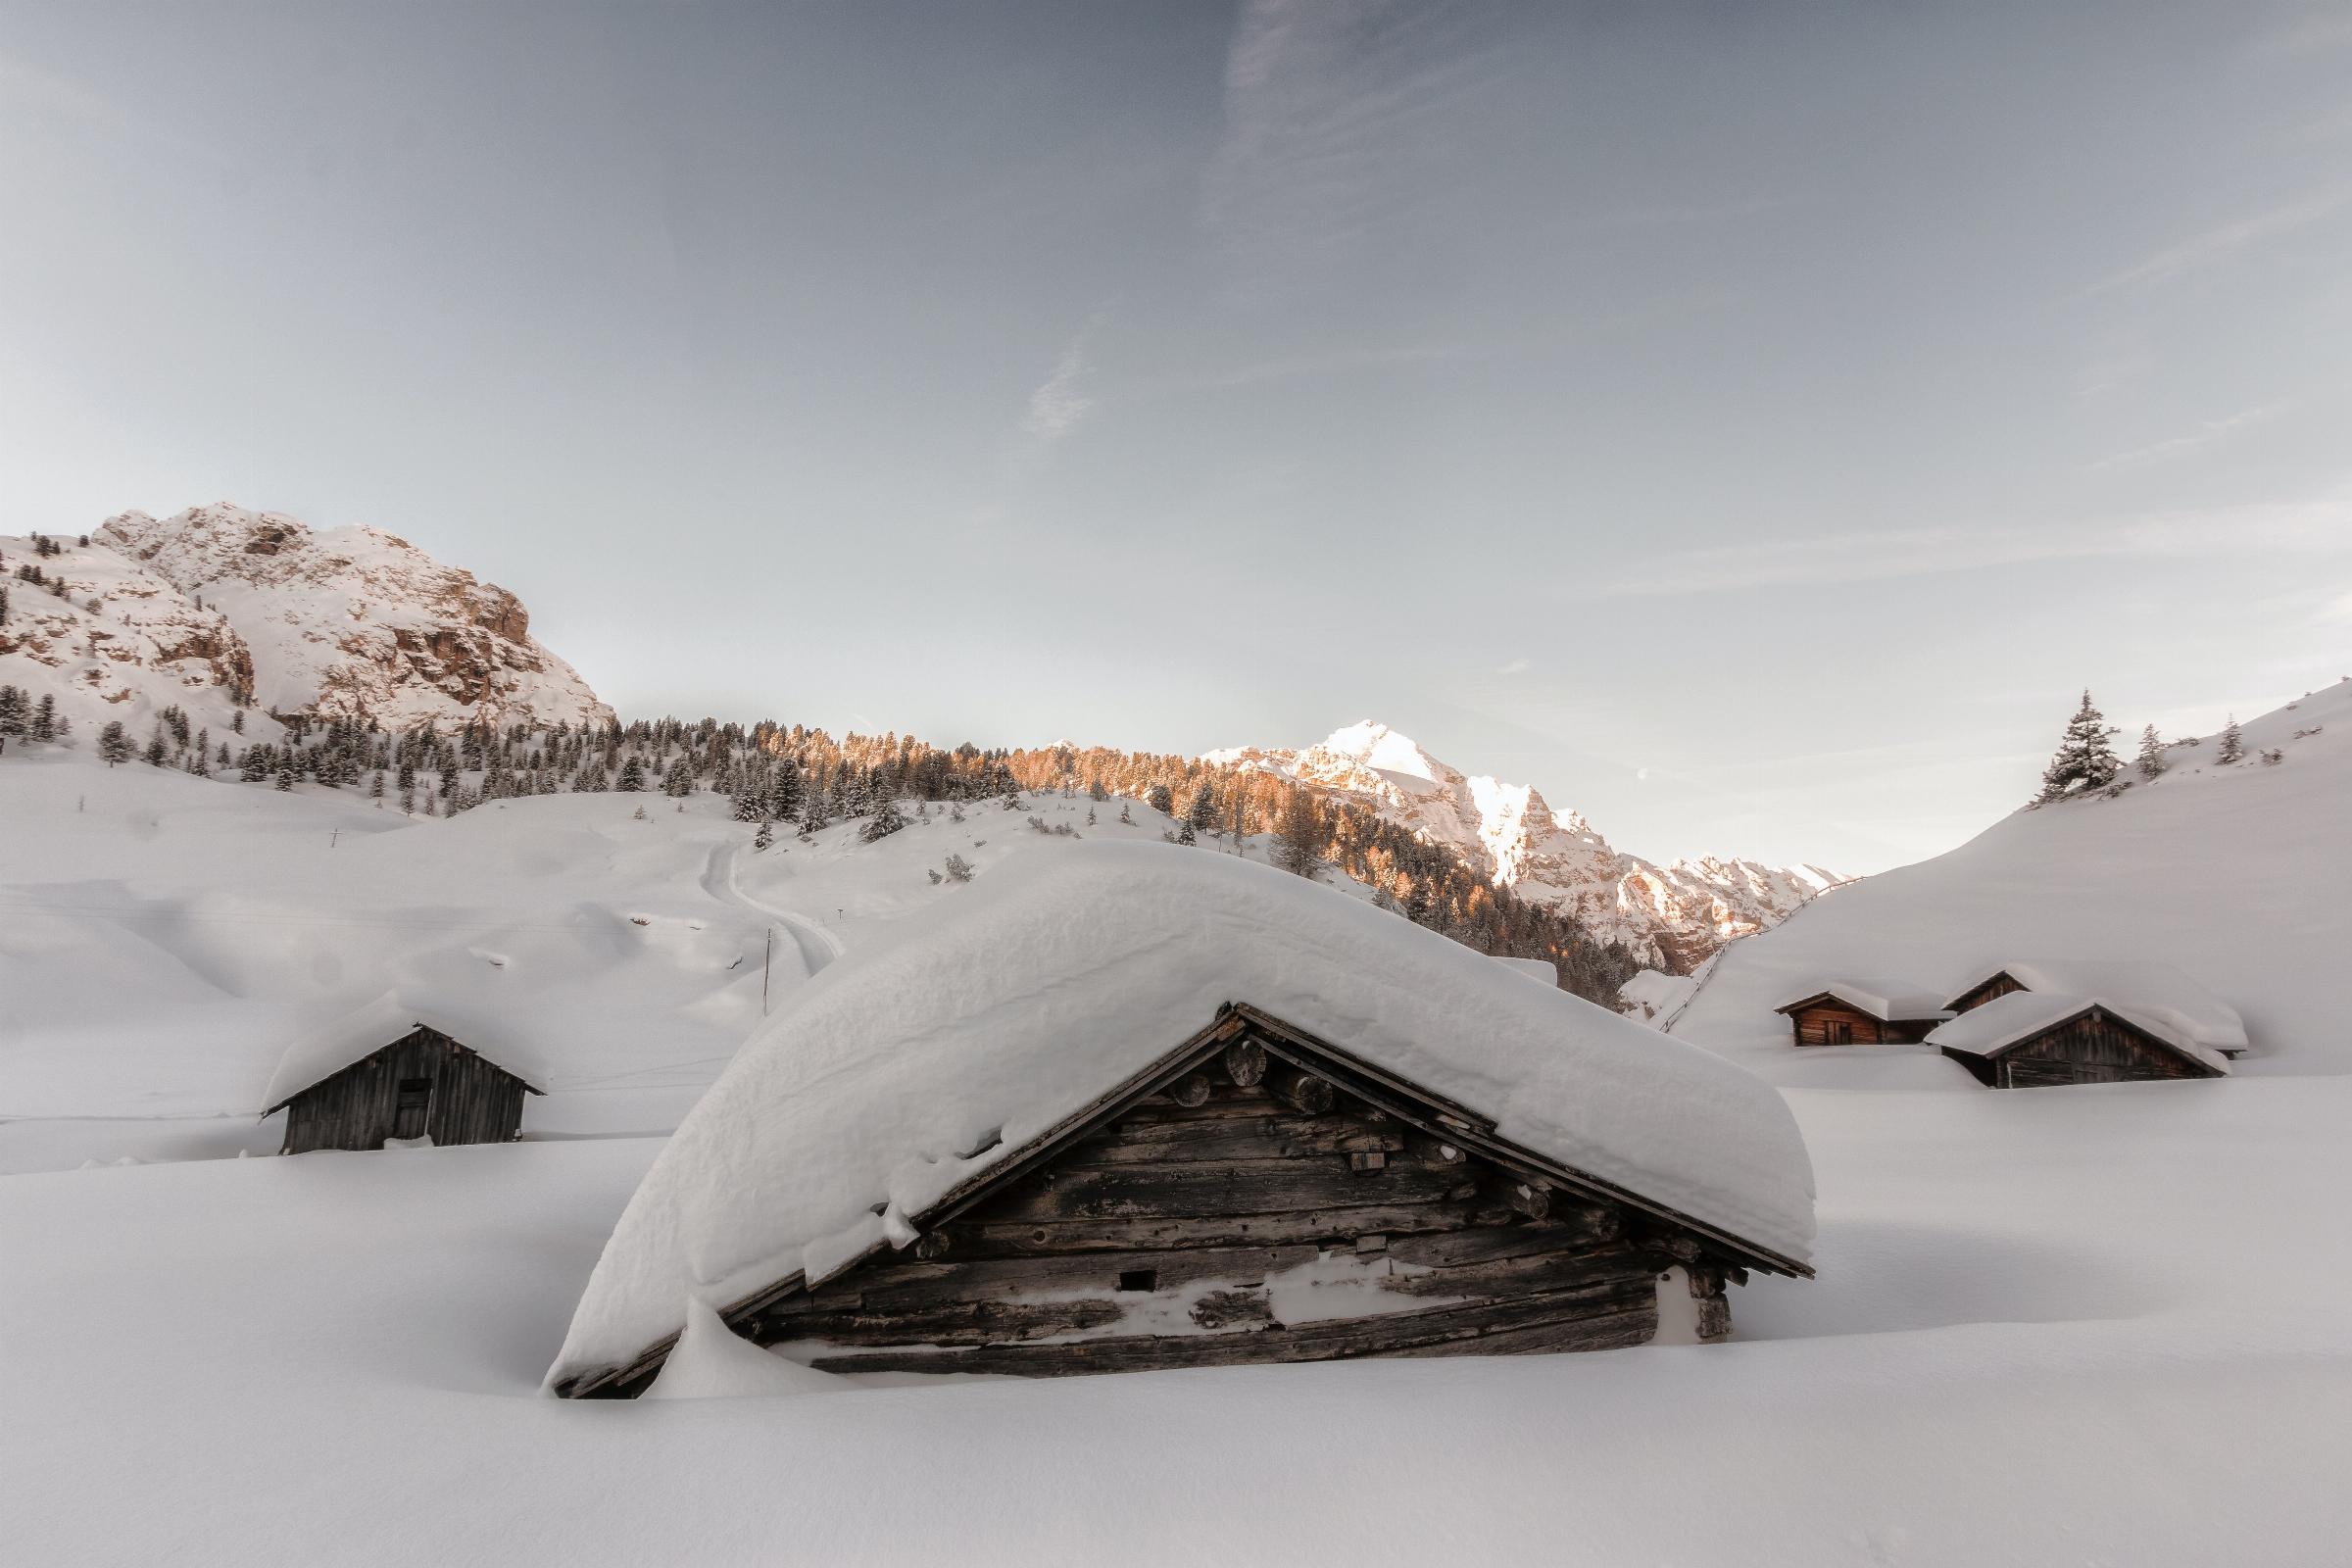 Hvor mye snø tåler taket?